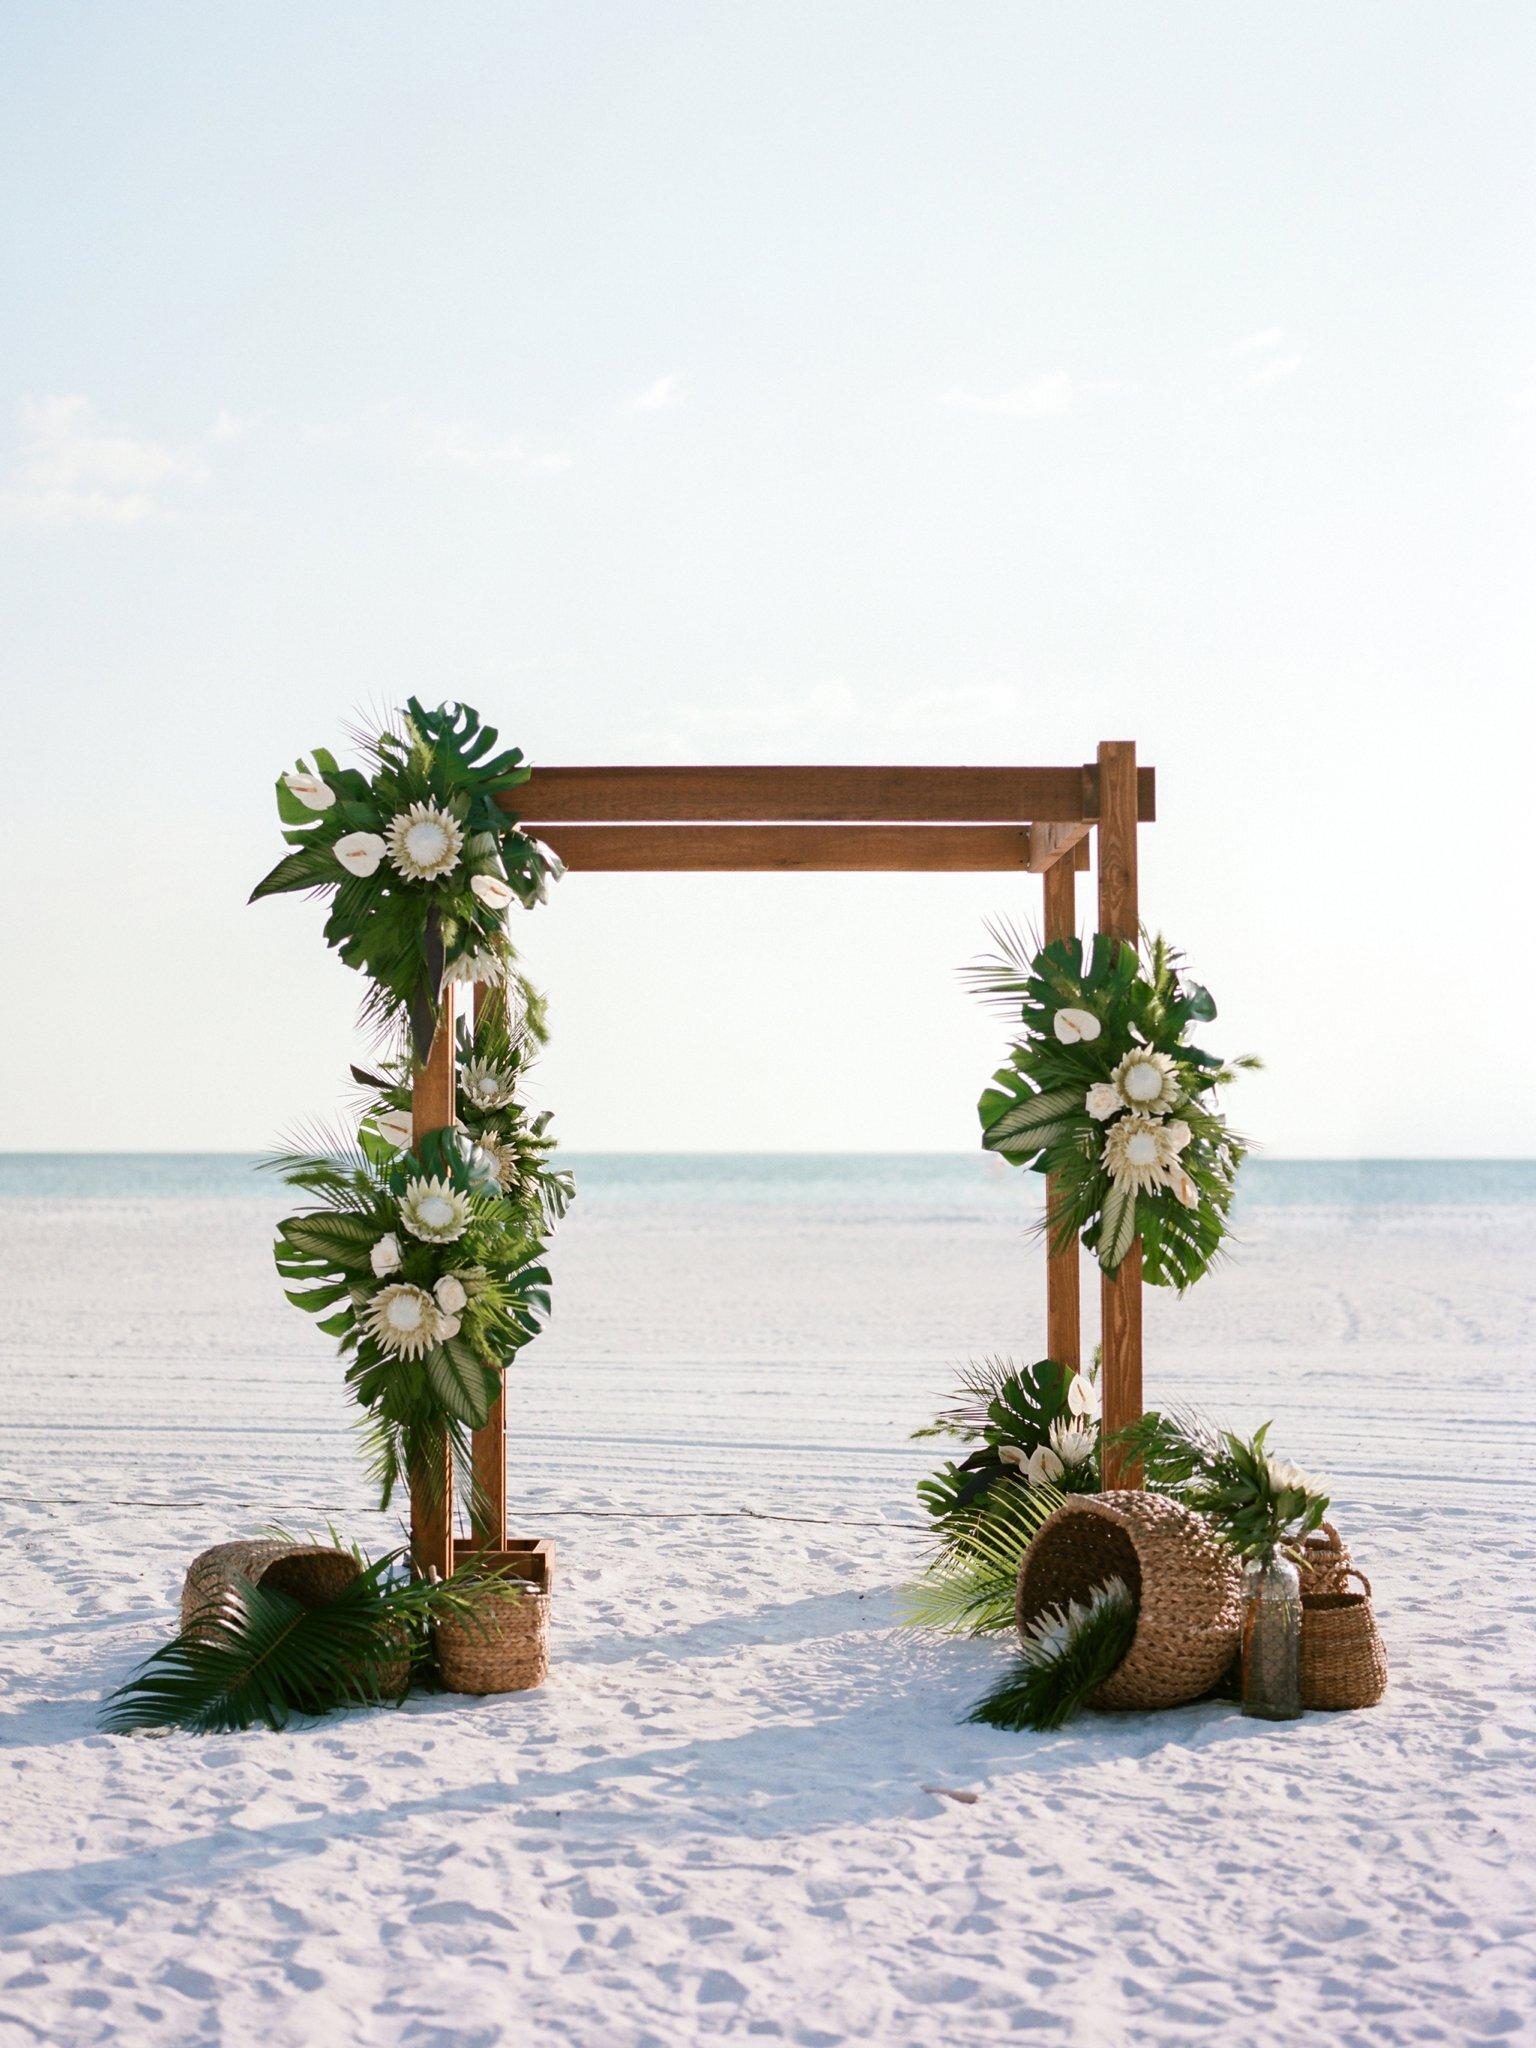 jw marriott marco island wedding photographer marco island wedding photographer shannon griffin photography_0129.jpg